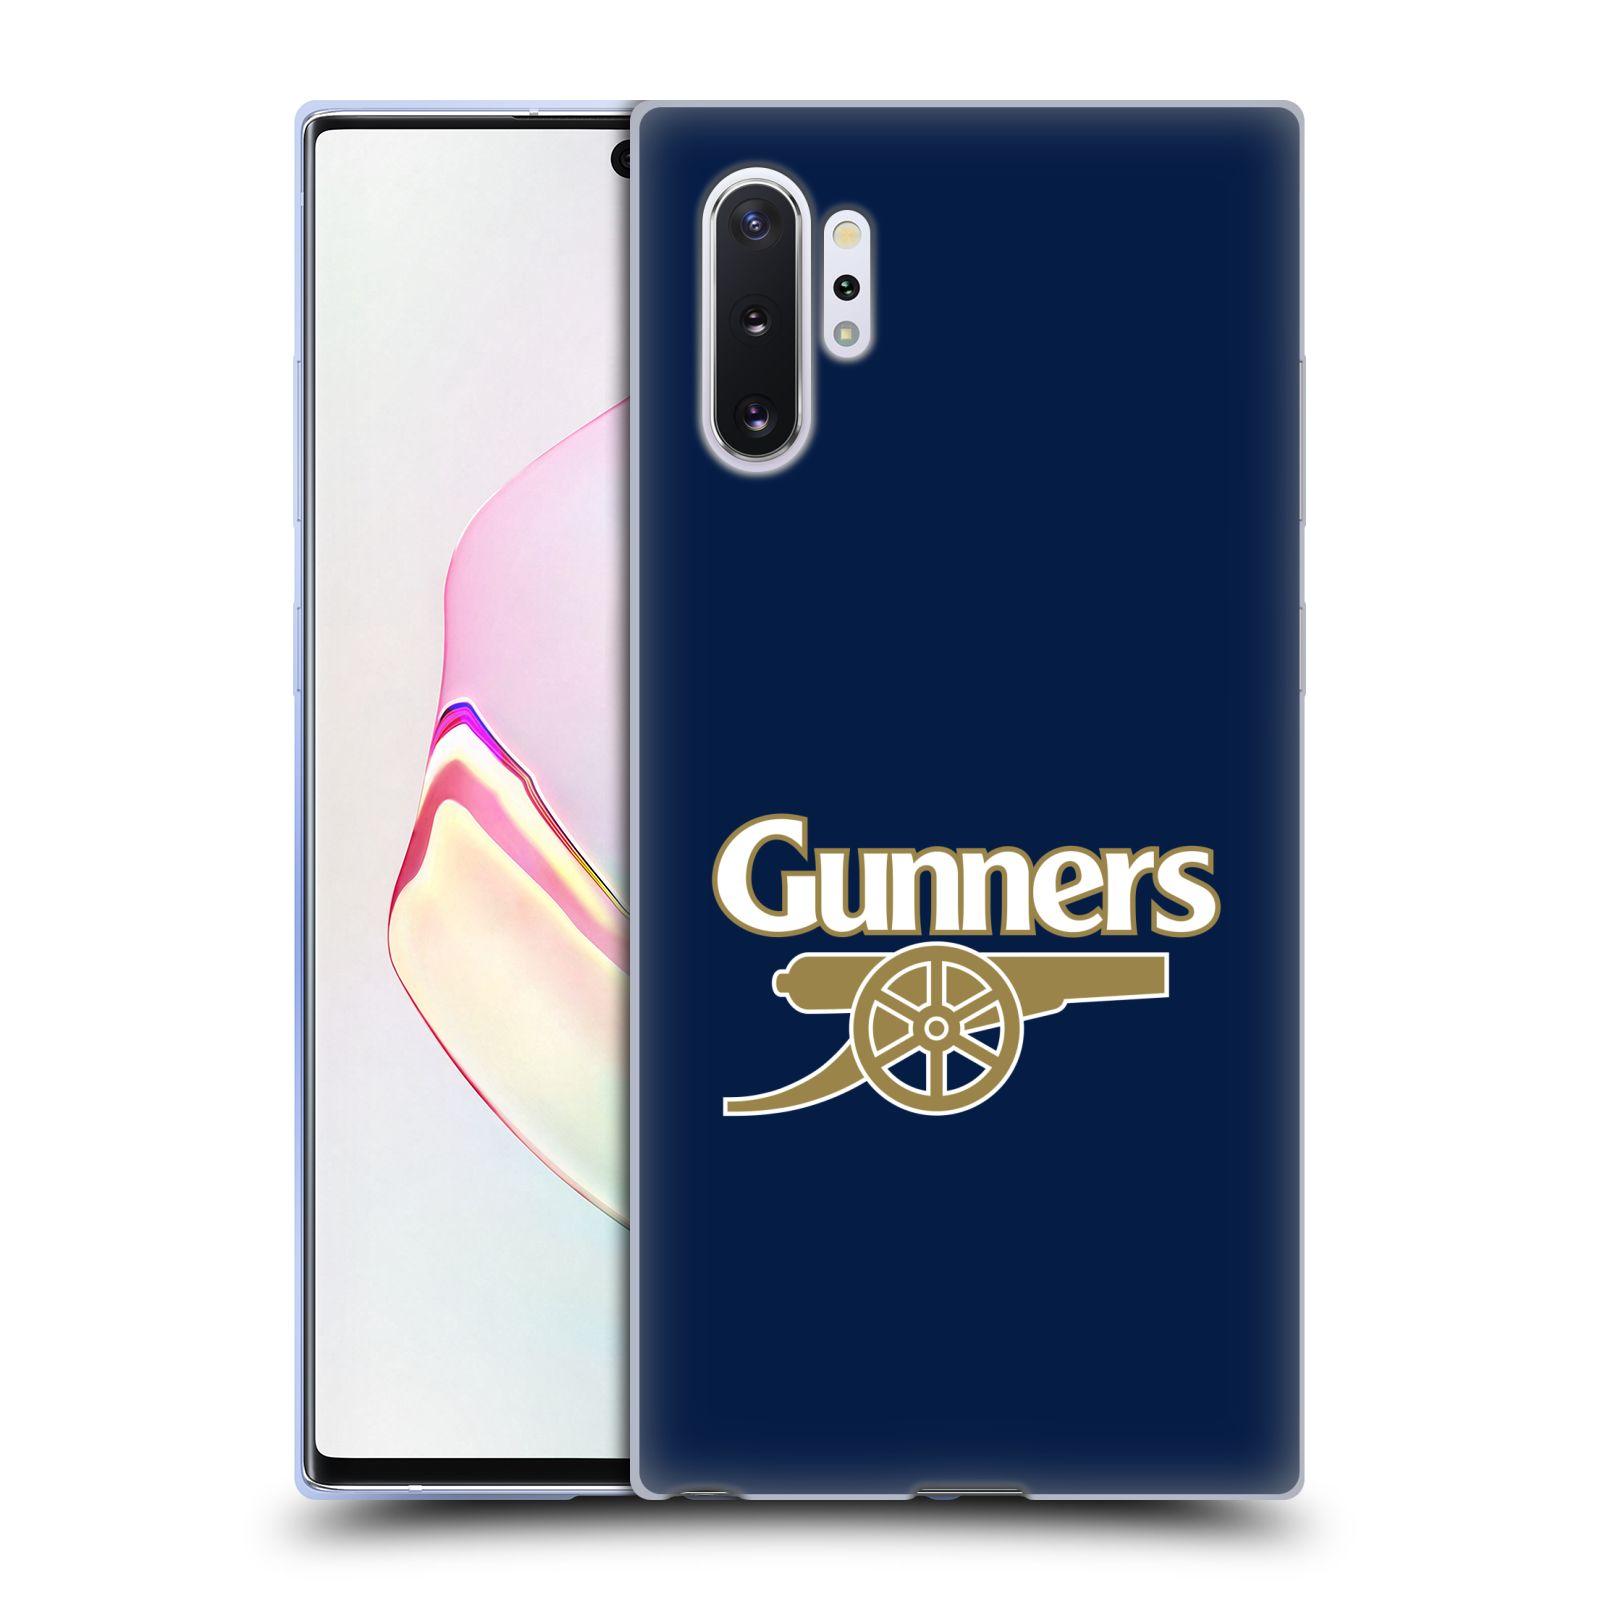 Silikonové pouzdro na mobil Samsung Galaxy Note 10 Plus - Head Case - Arsenal FC - Gunners